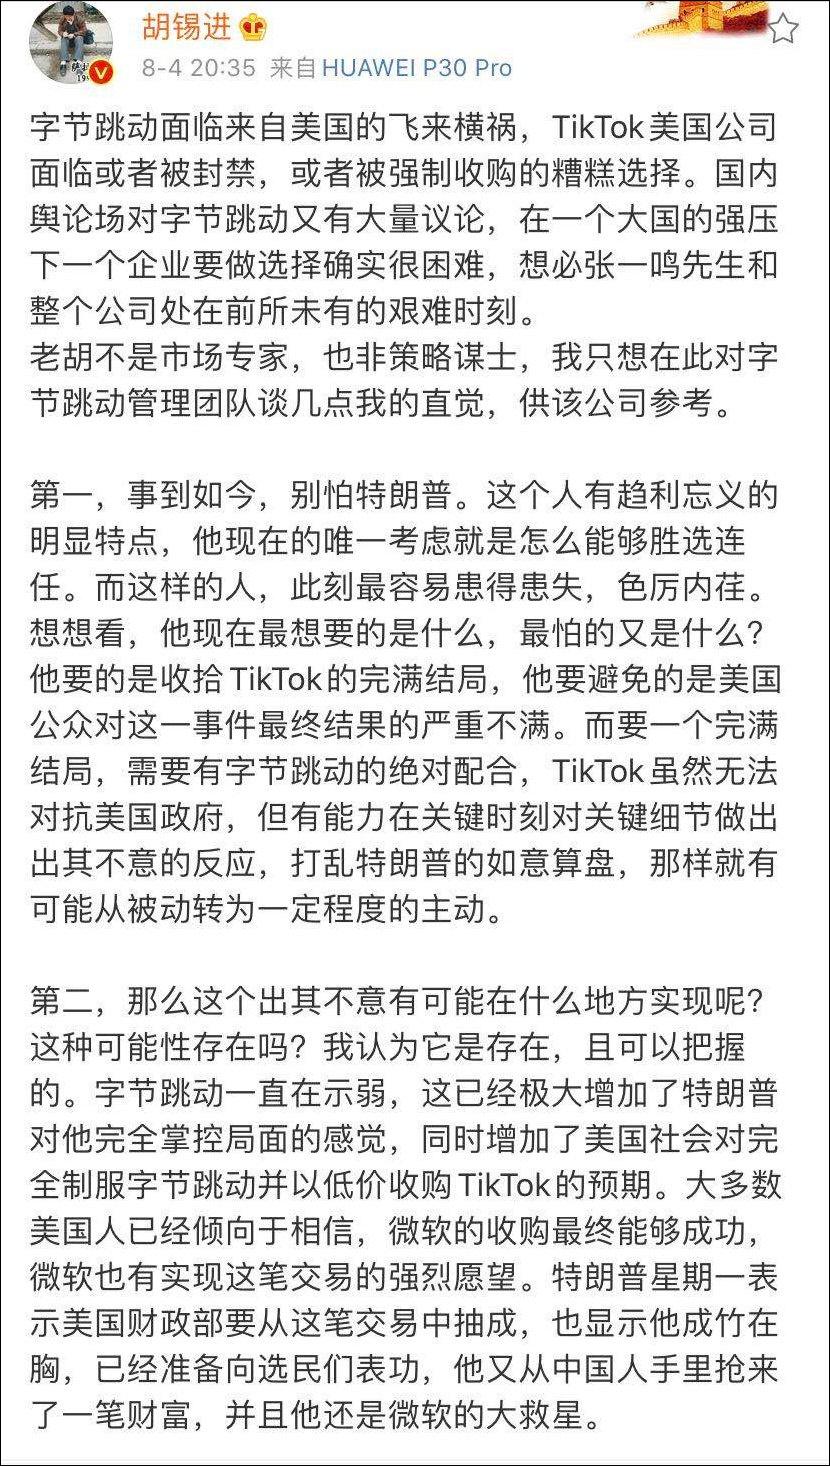 http://www.umeiwen.com/junshi/2247613.html